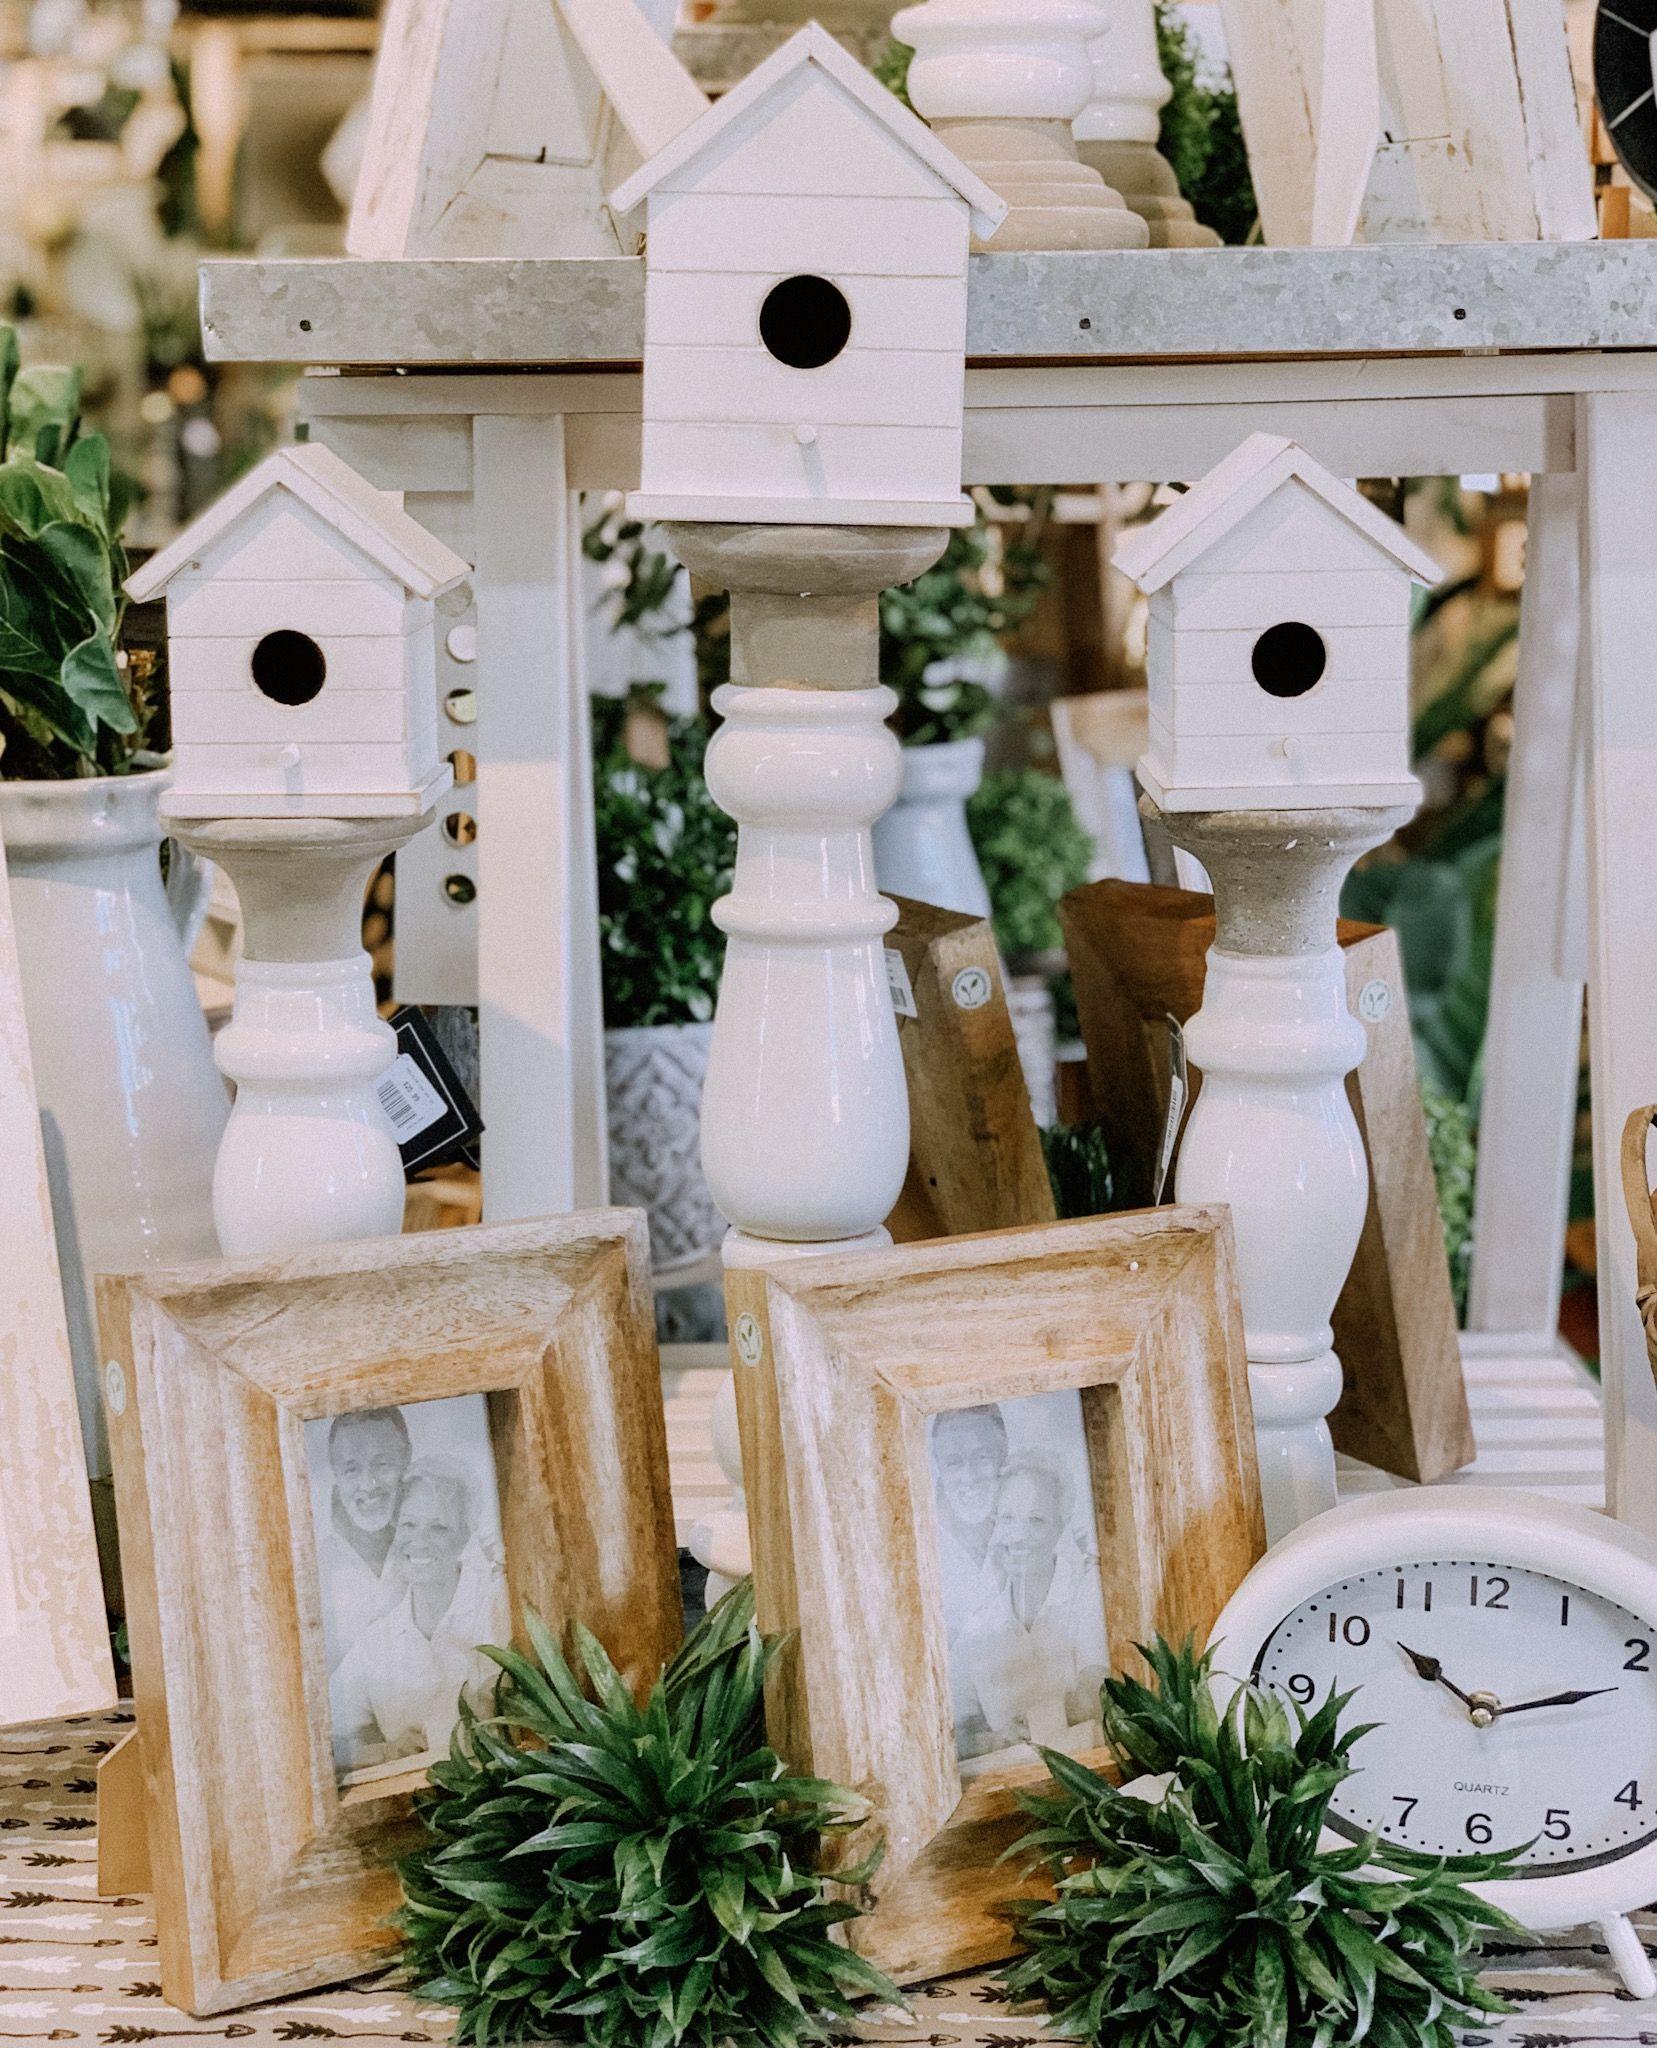 Unique Homedecor: Bird Houses, Unique Home Decor , Farmhouse Decor